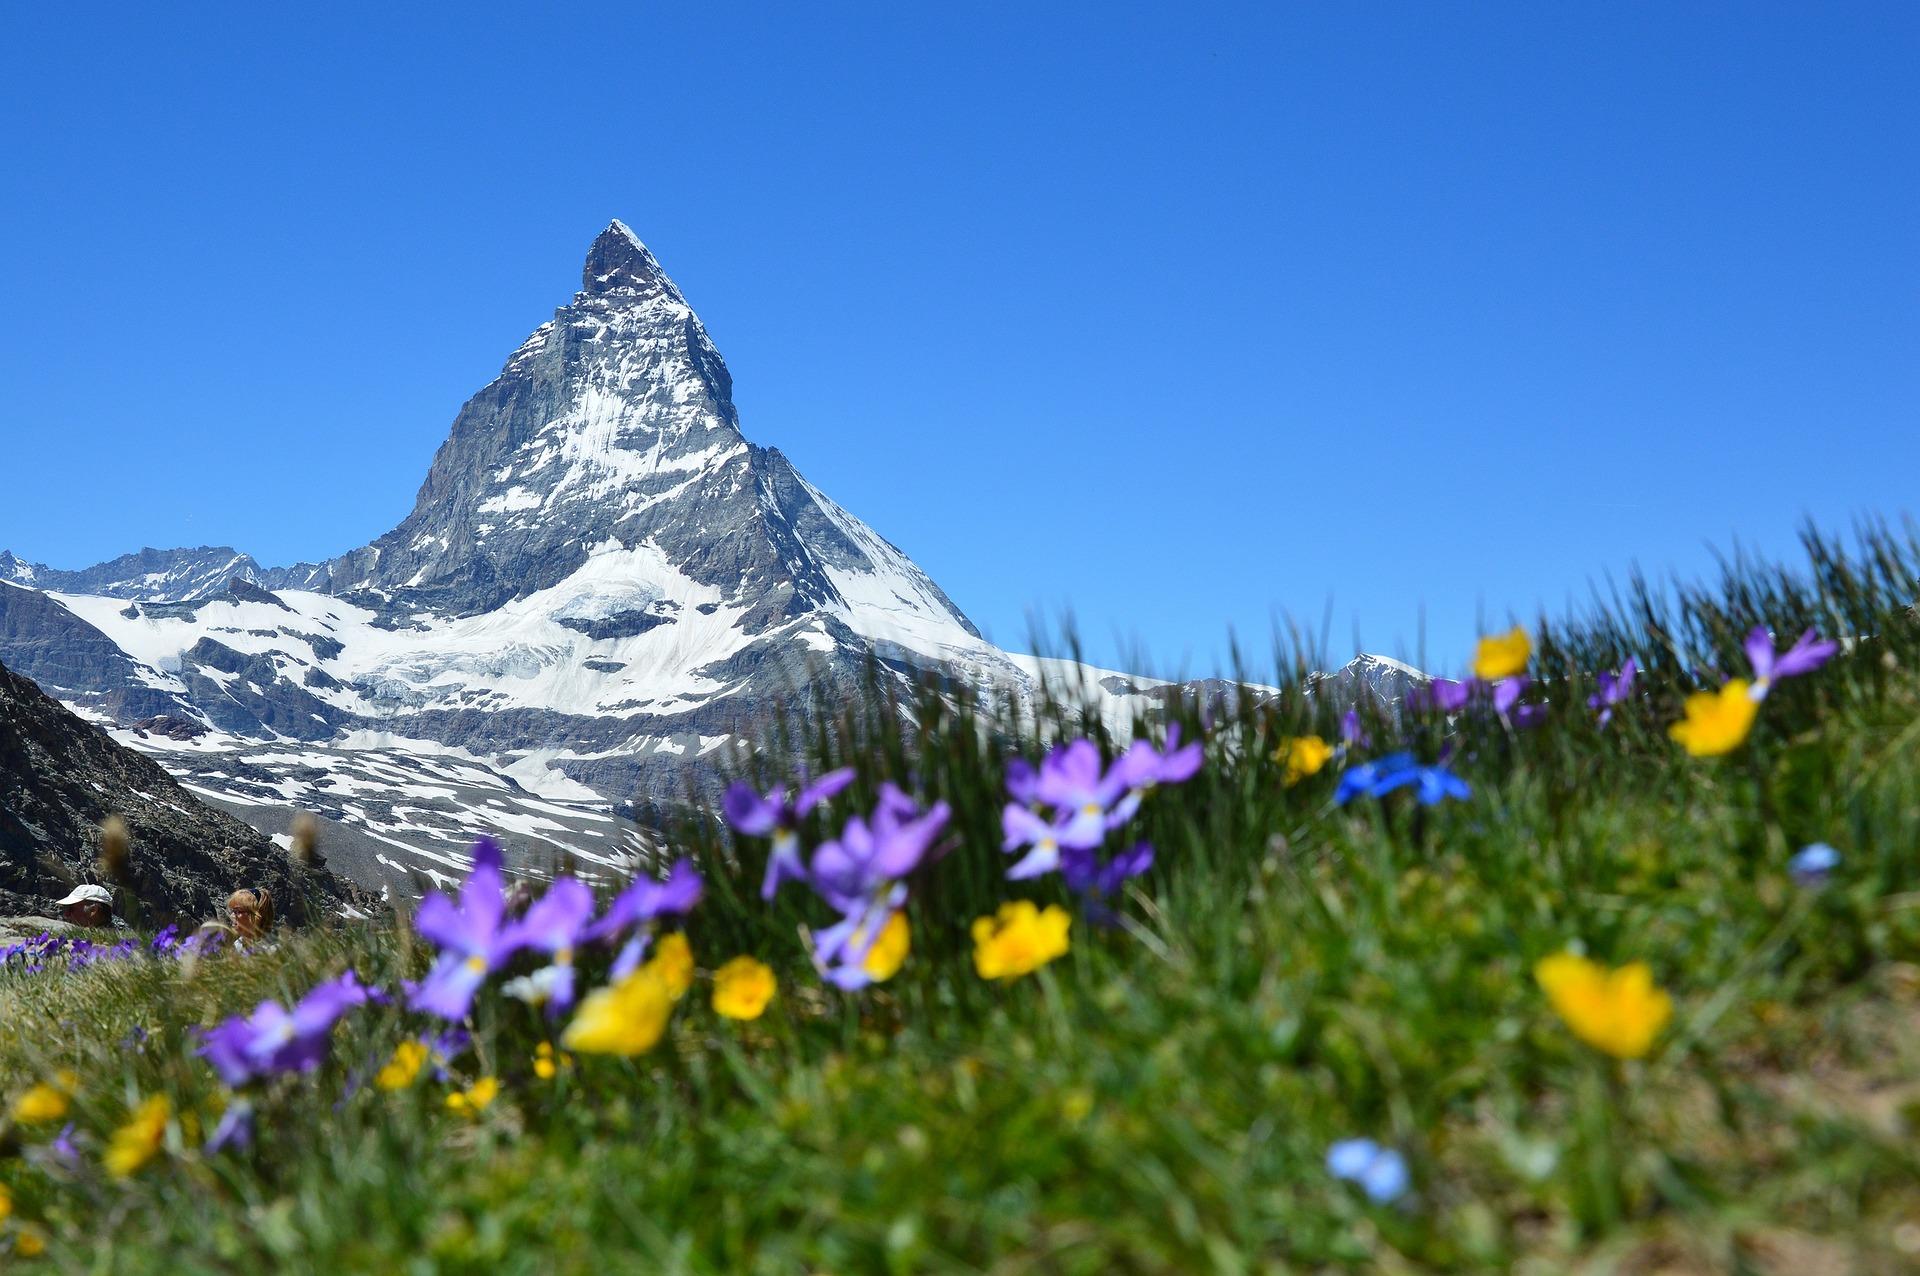 Ingolf Derkow und das Bergwandern Alpen Matterhorn-1516733_1920